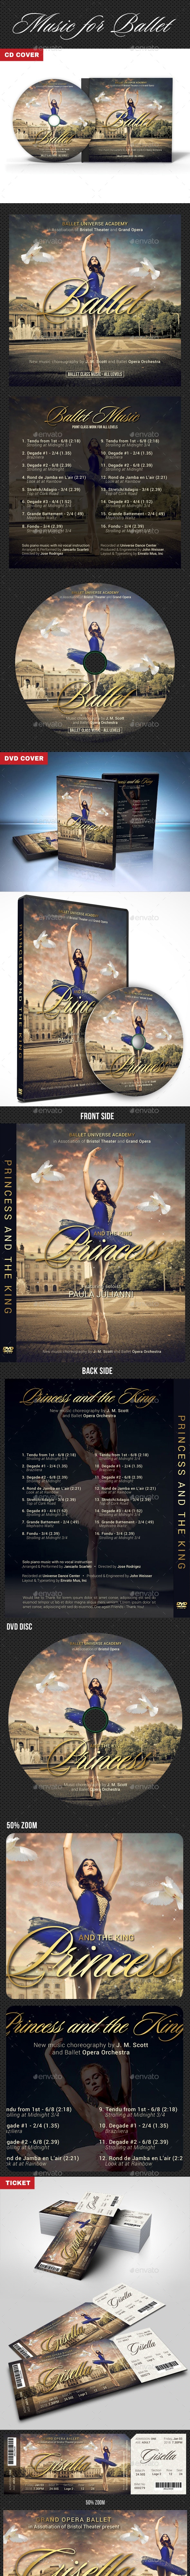 Ballet CD DVD Ticket Bundle - CD & DVD Artwork Print Templates